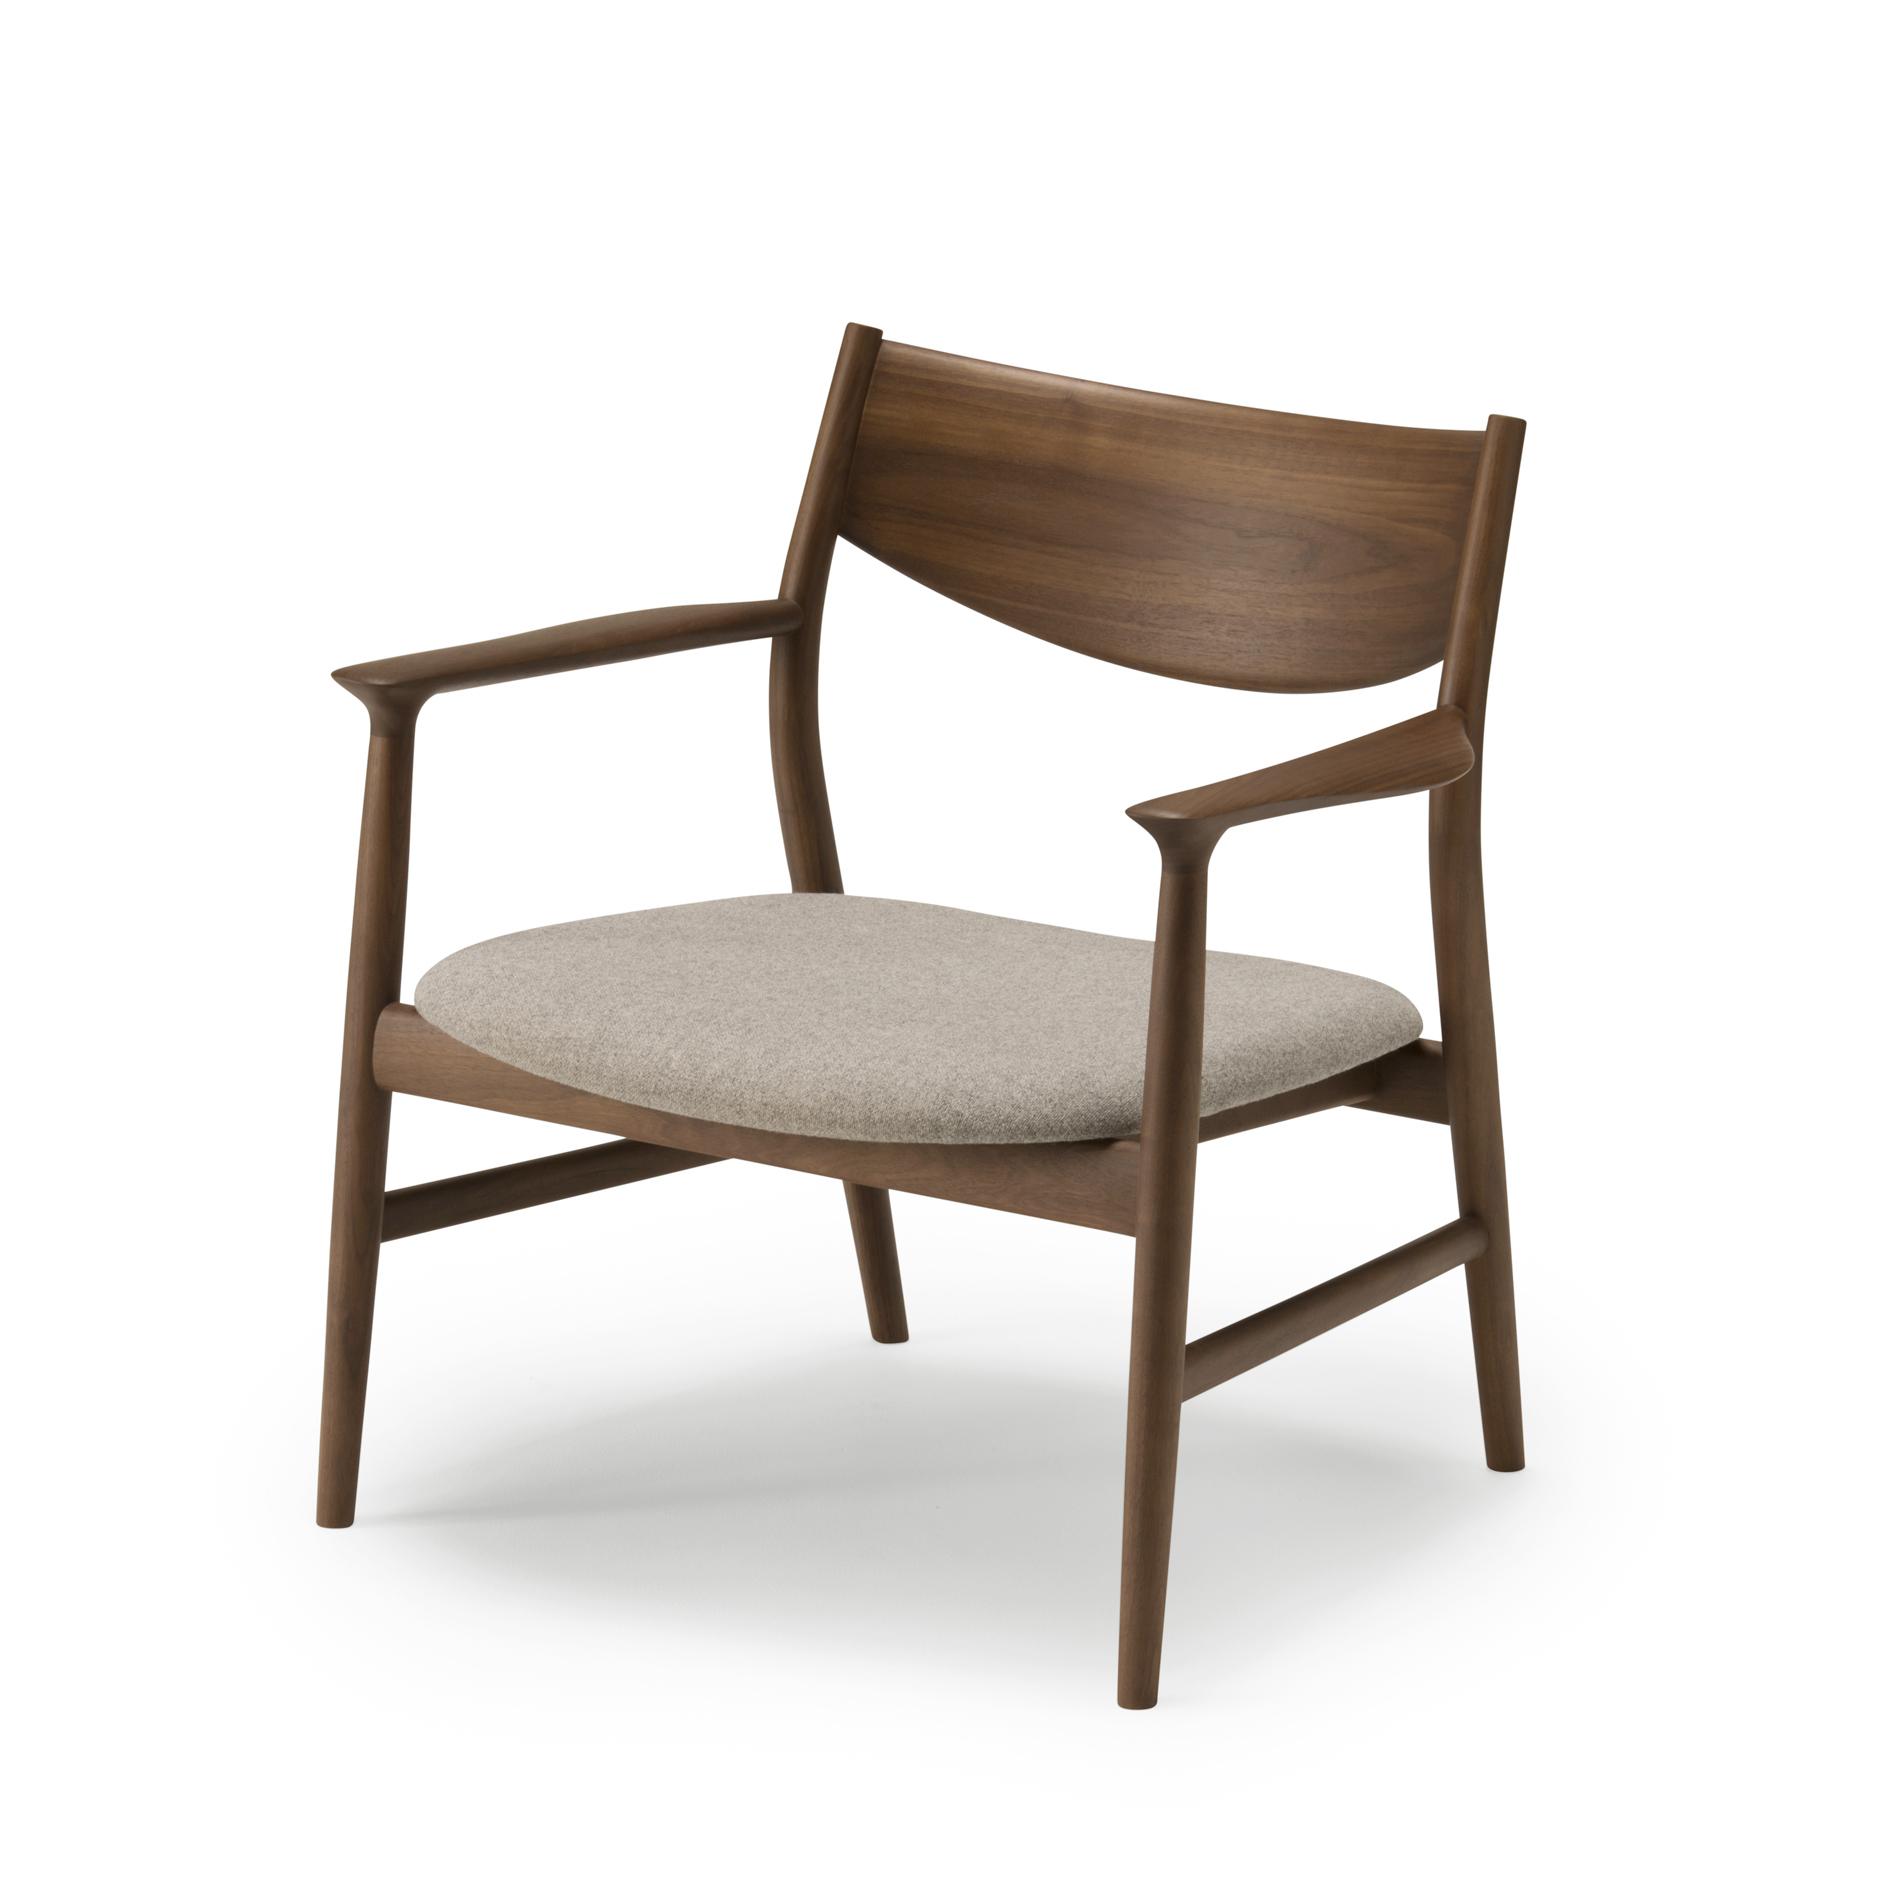 Japanese beautiful shape embracing backrest modern round lounge chair